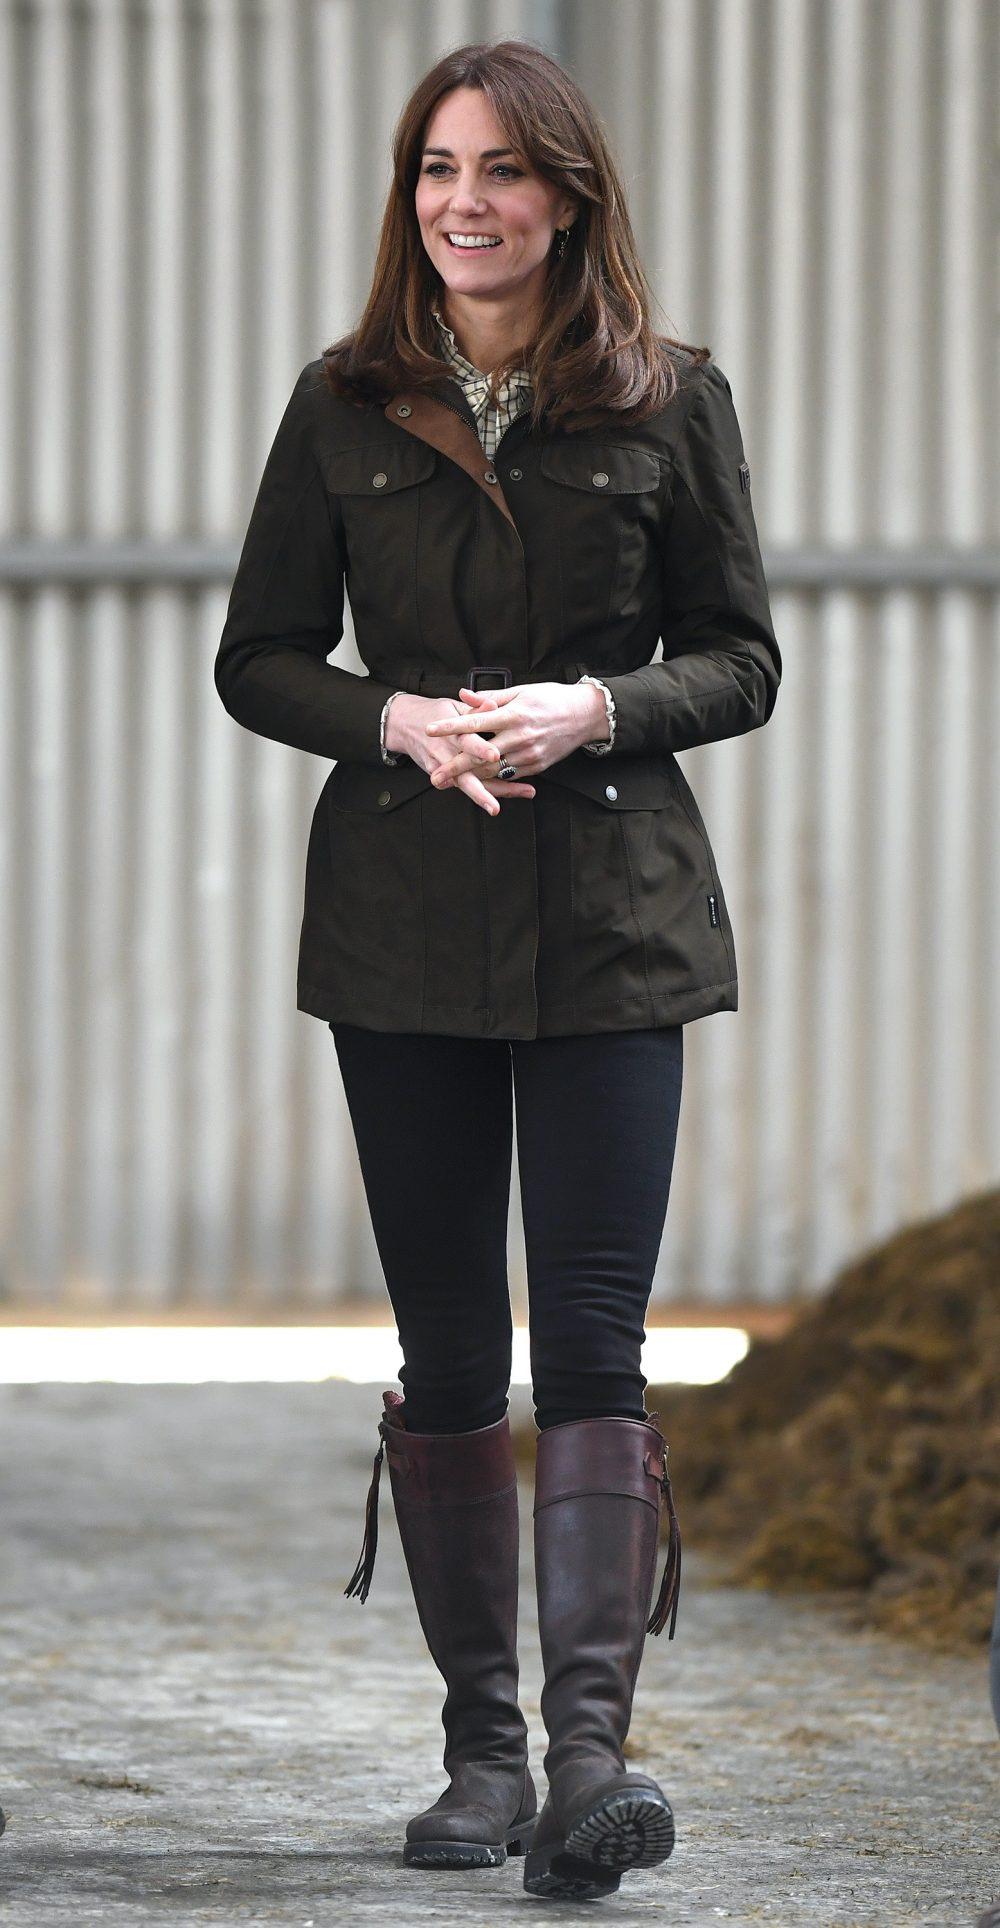 The Duke and Duchess of Cambridge visit Teagasc Research Farm